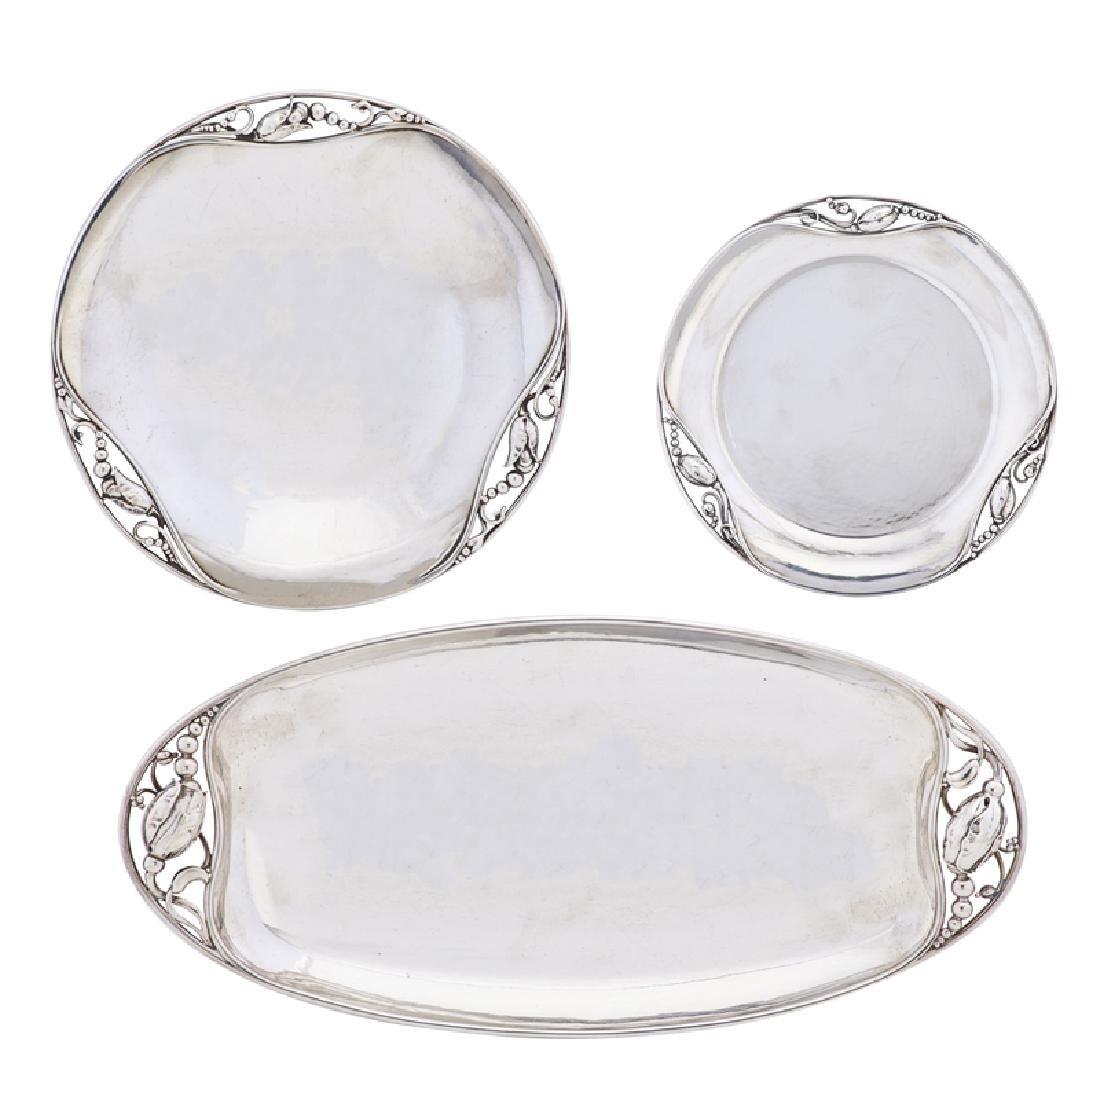 GEORG JENSEN Blossom bowls, plate